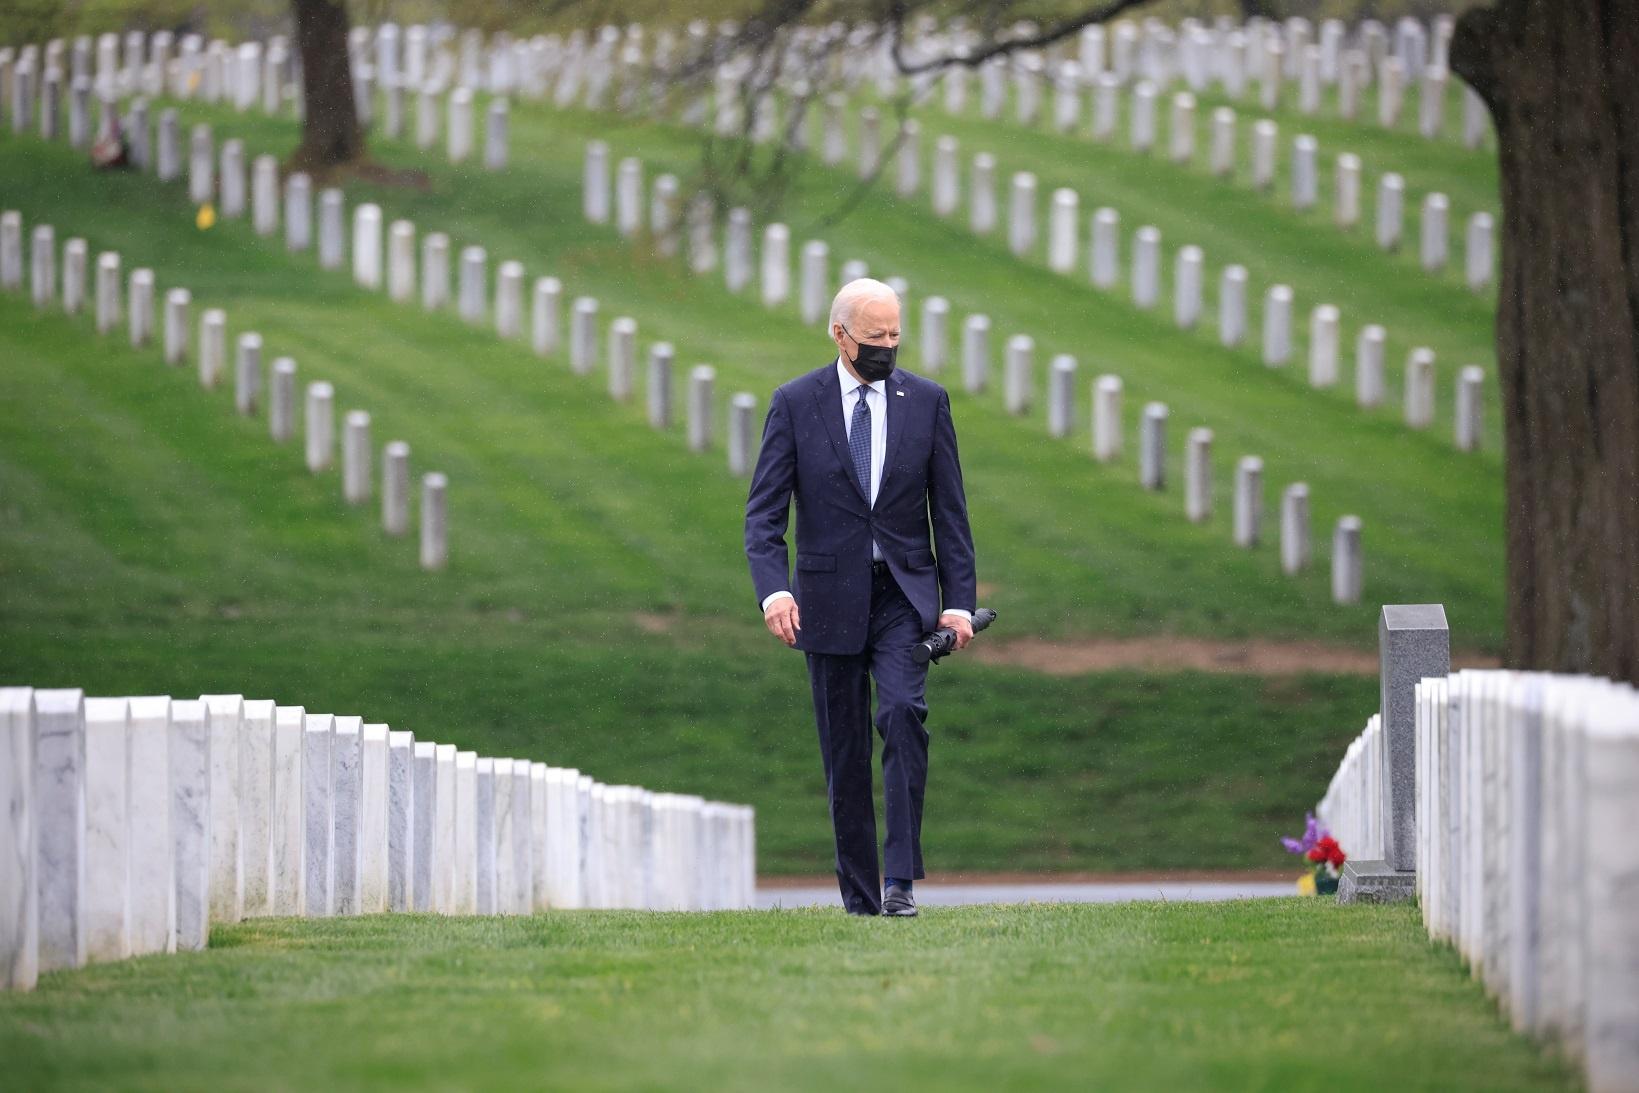 Biden thong bao rut quan khoi Afghanistan anh 4